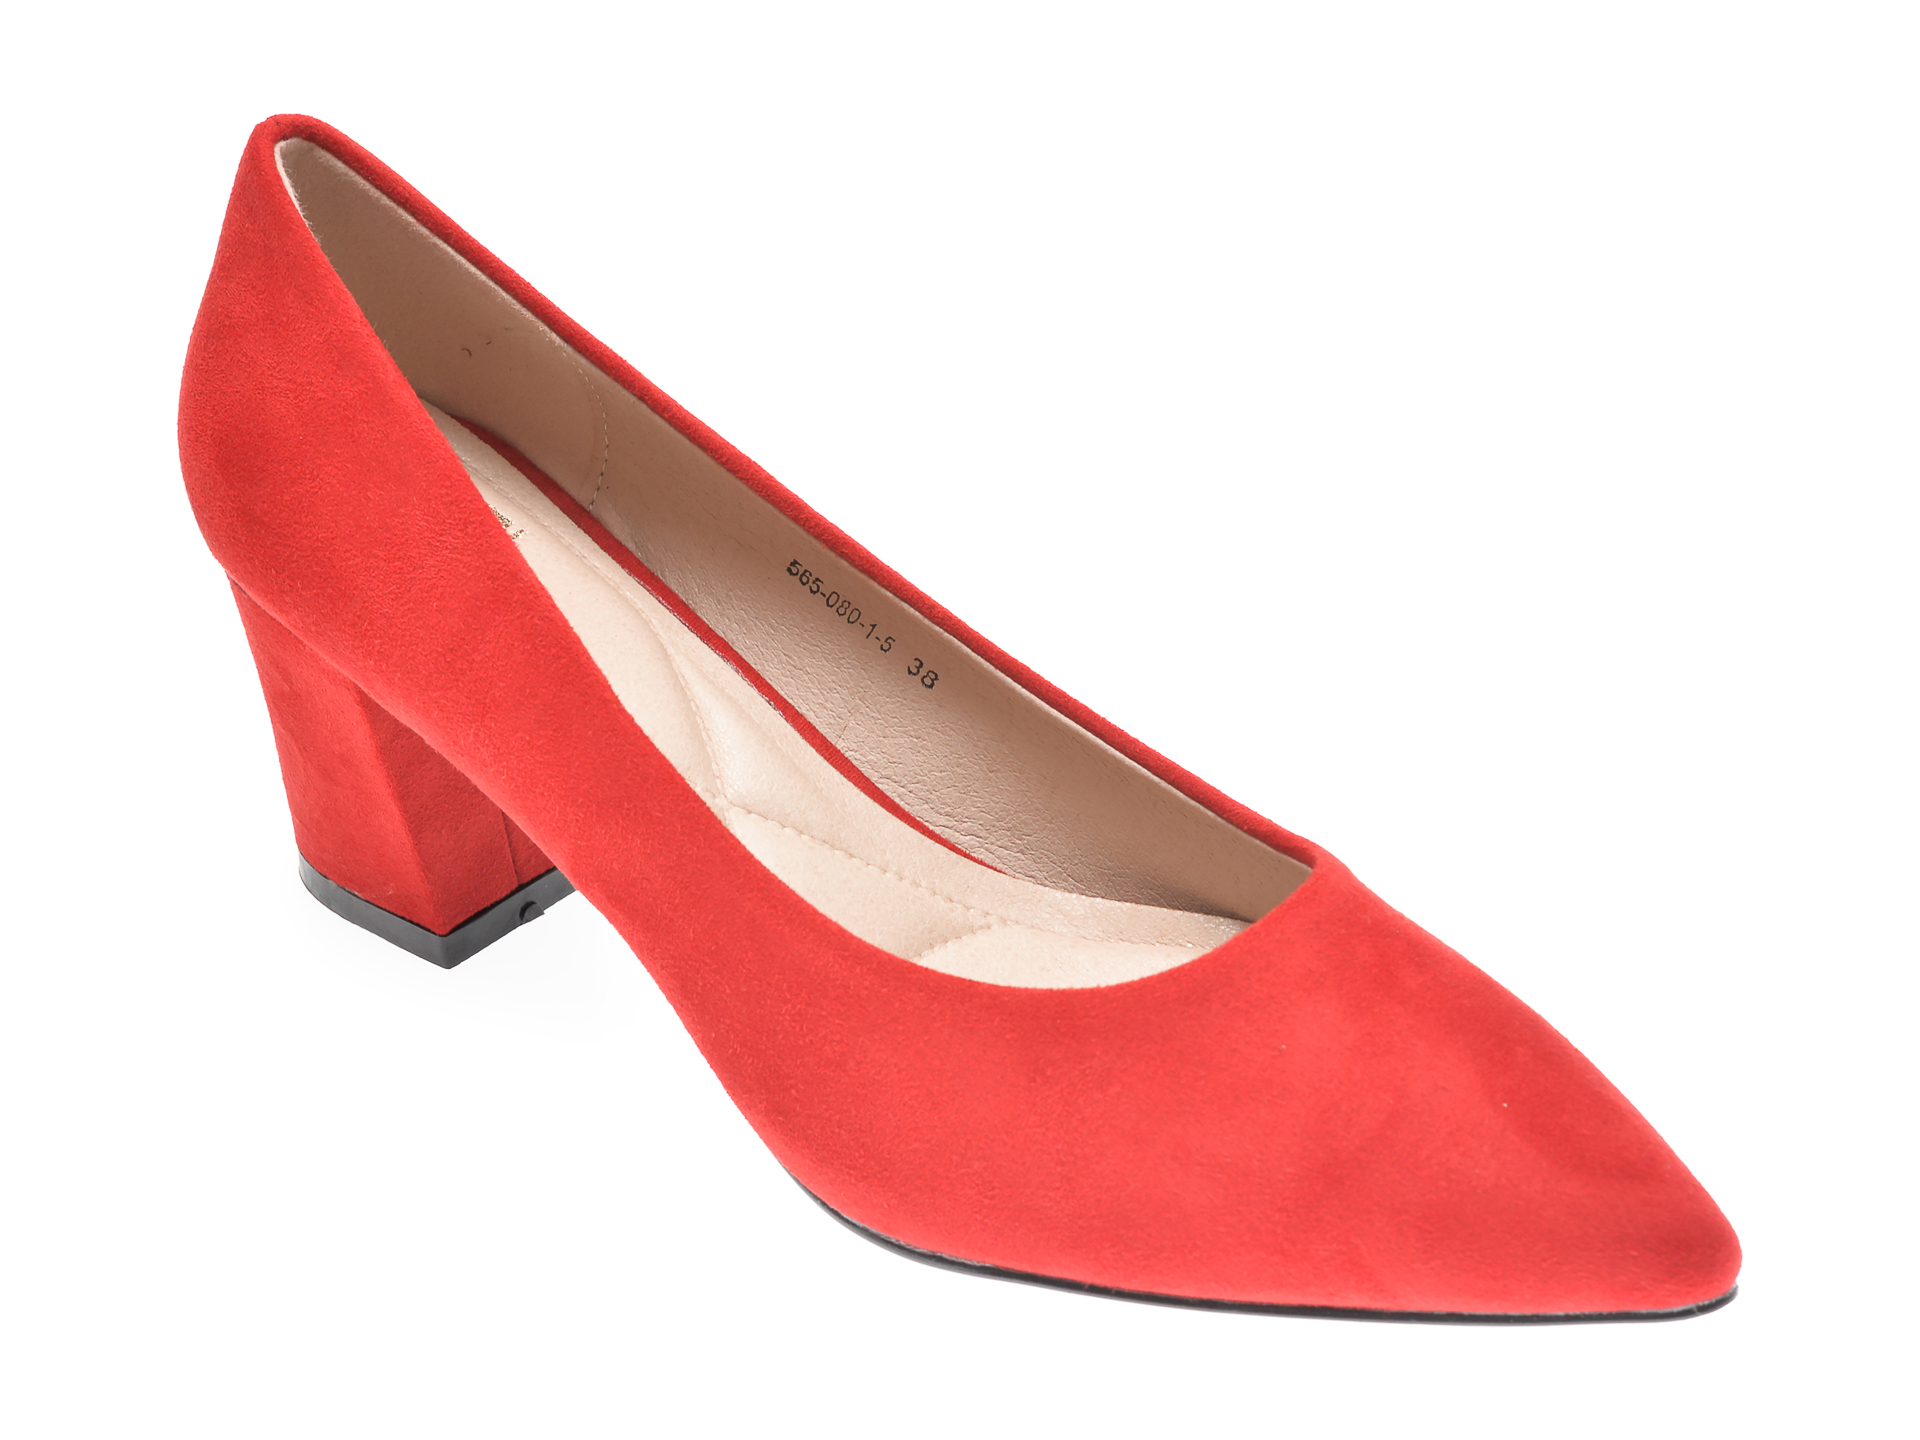 Pantofi RIO FIORE rosii, 565080, din piele ecologica imagine otter.ro